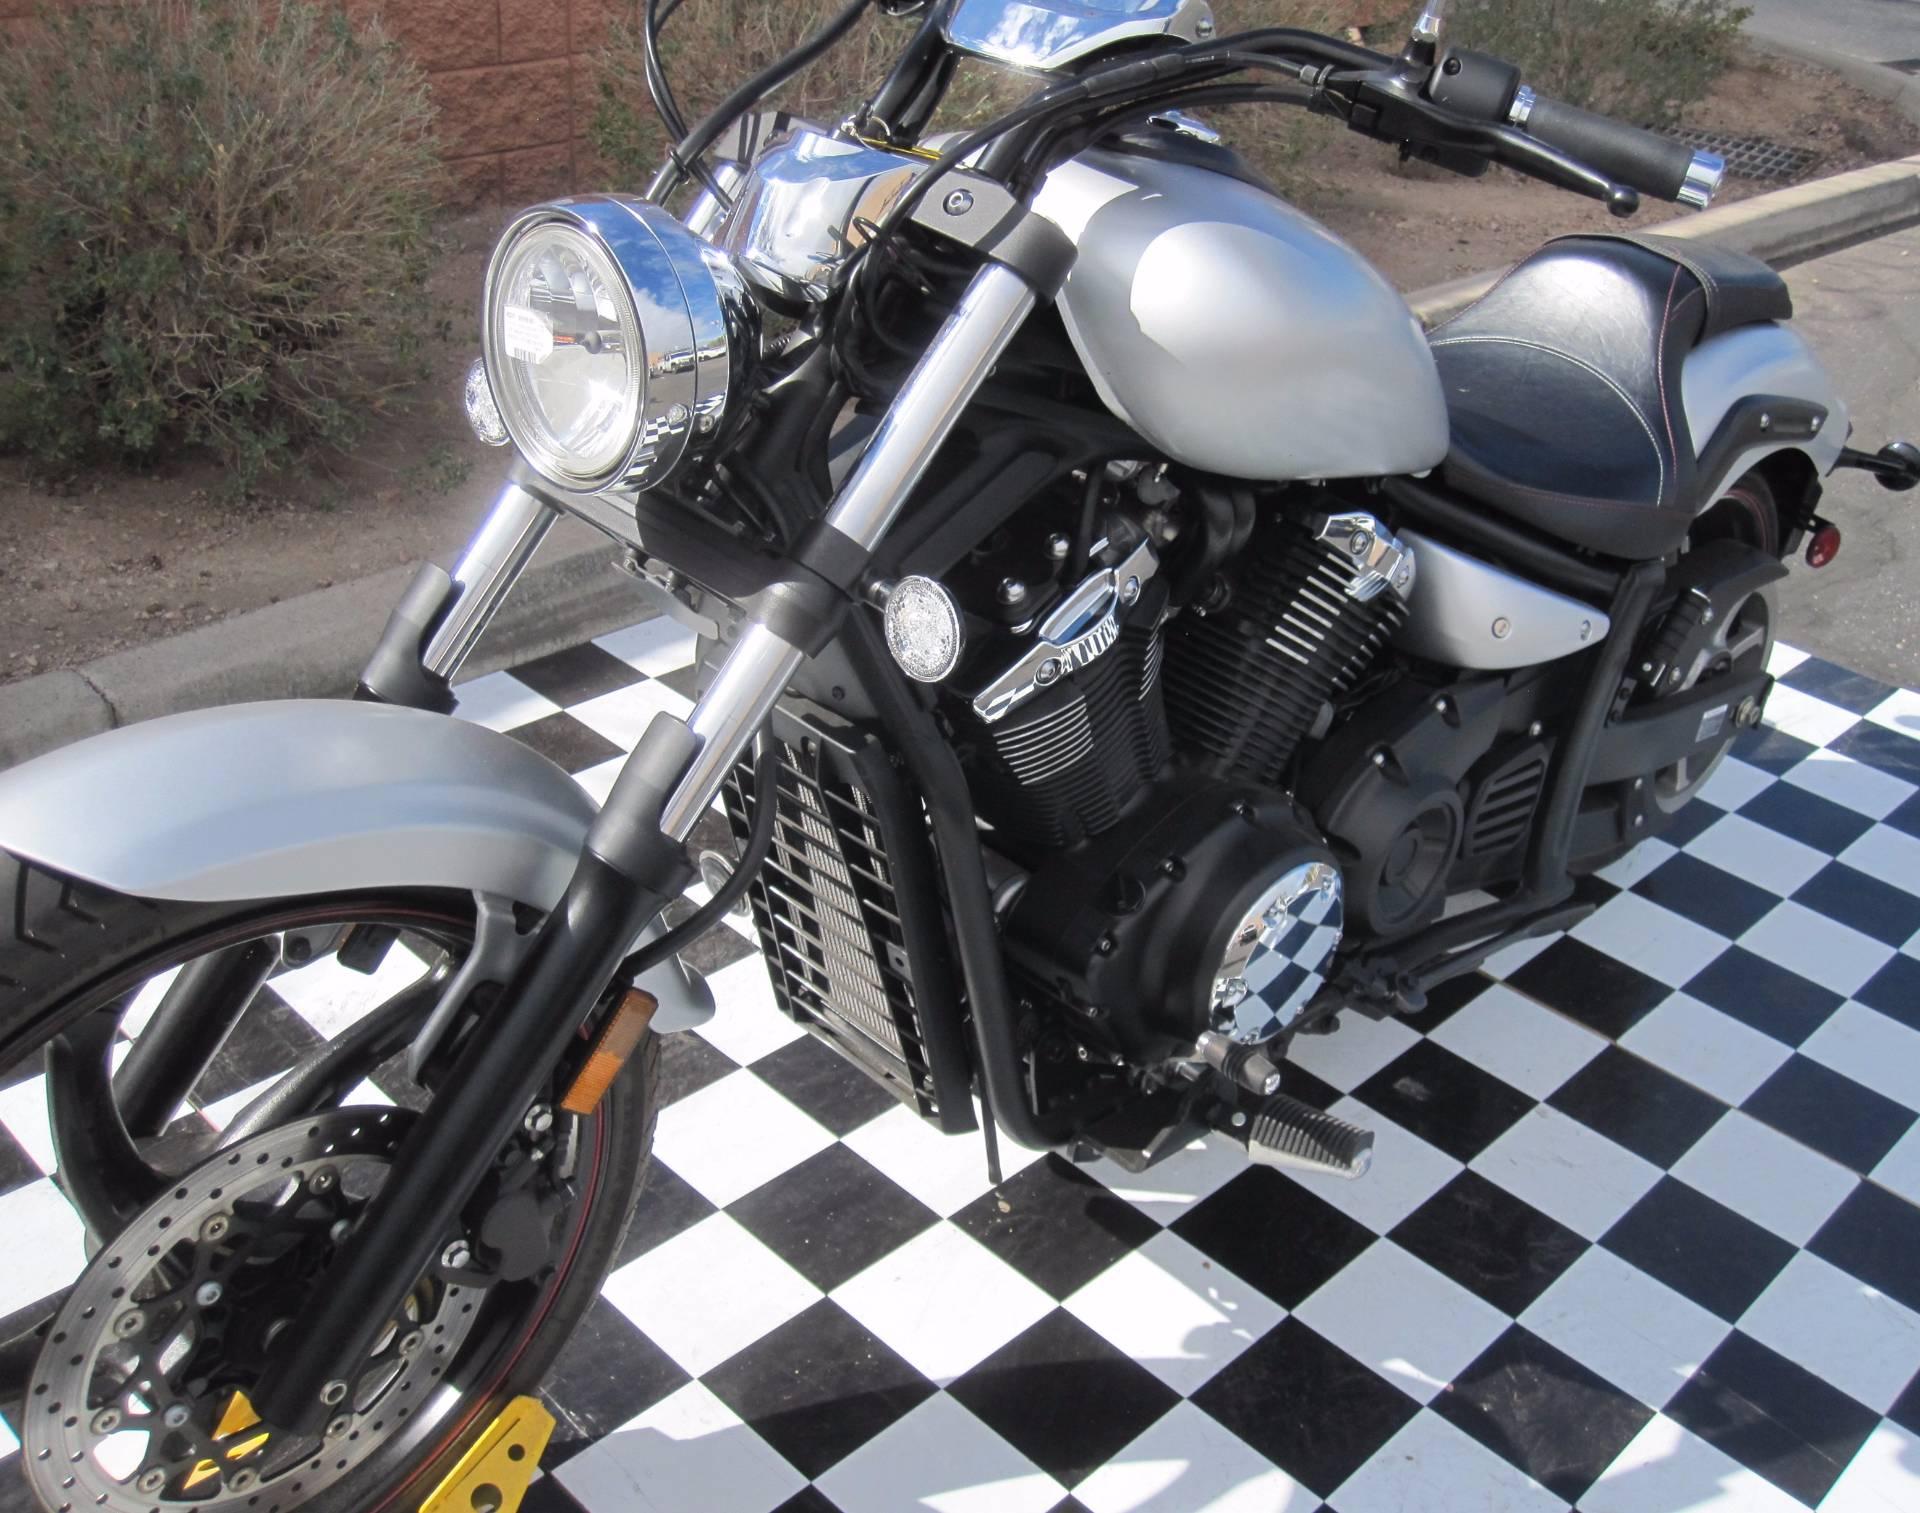 2015 Yamaha Stryker in Phoenix, Arizona